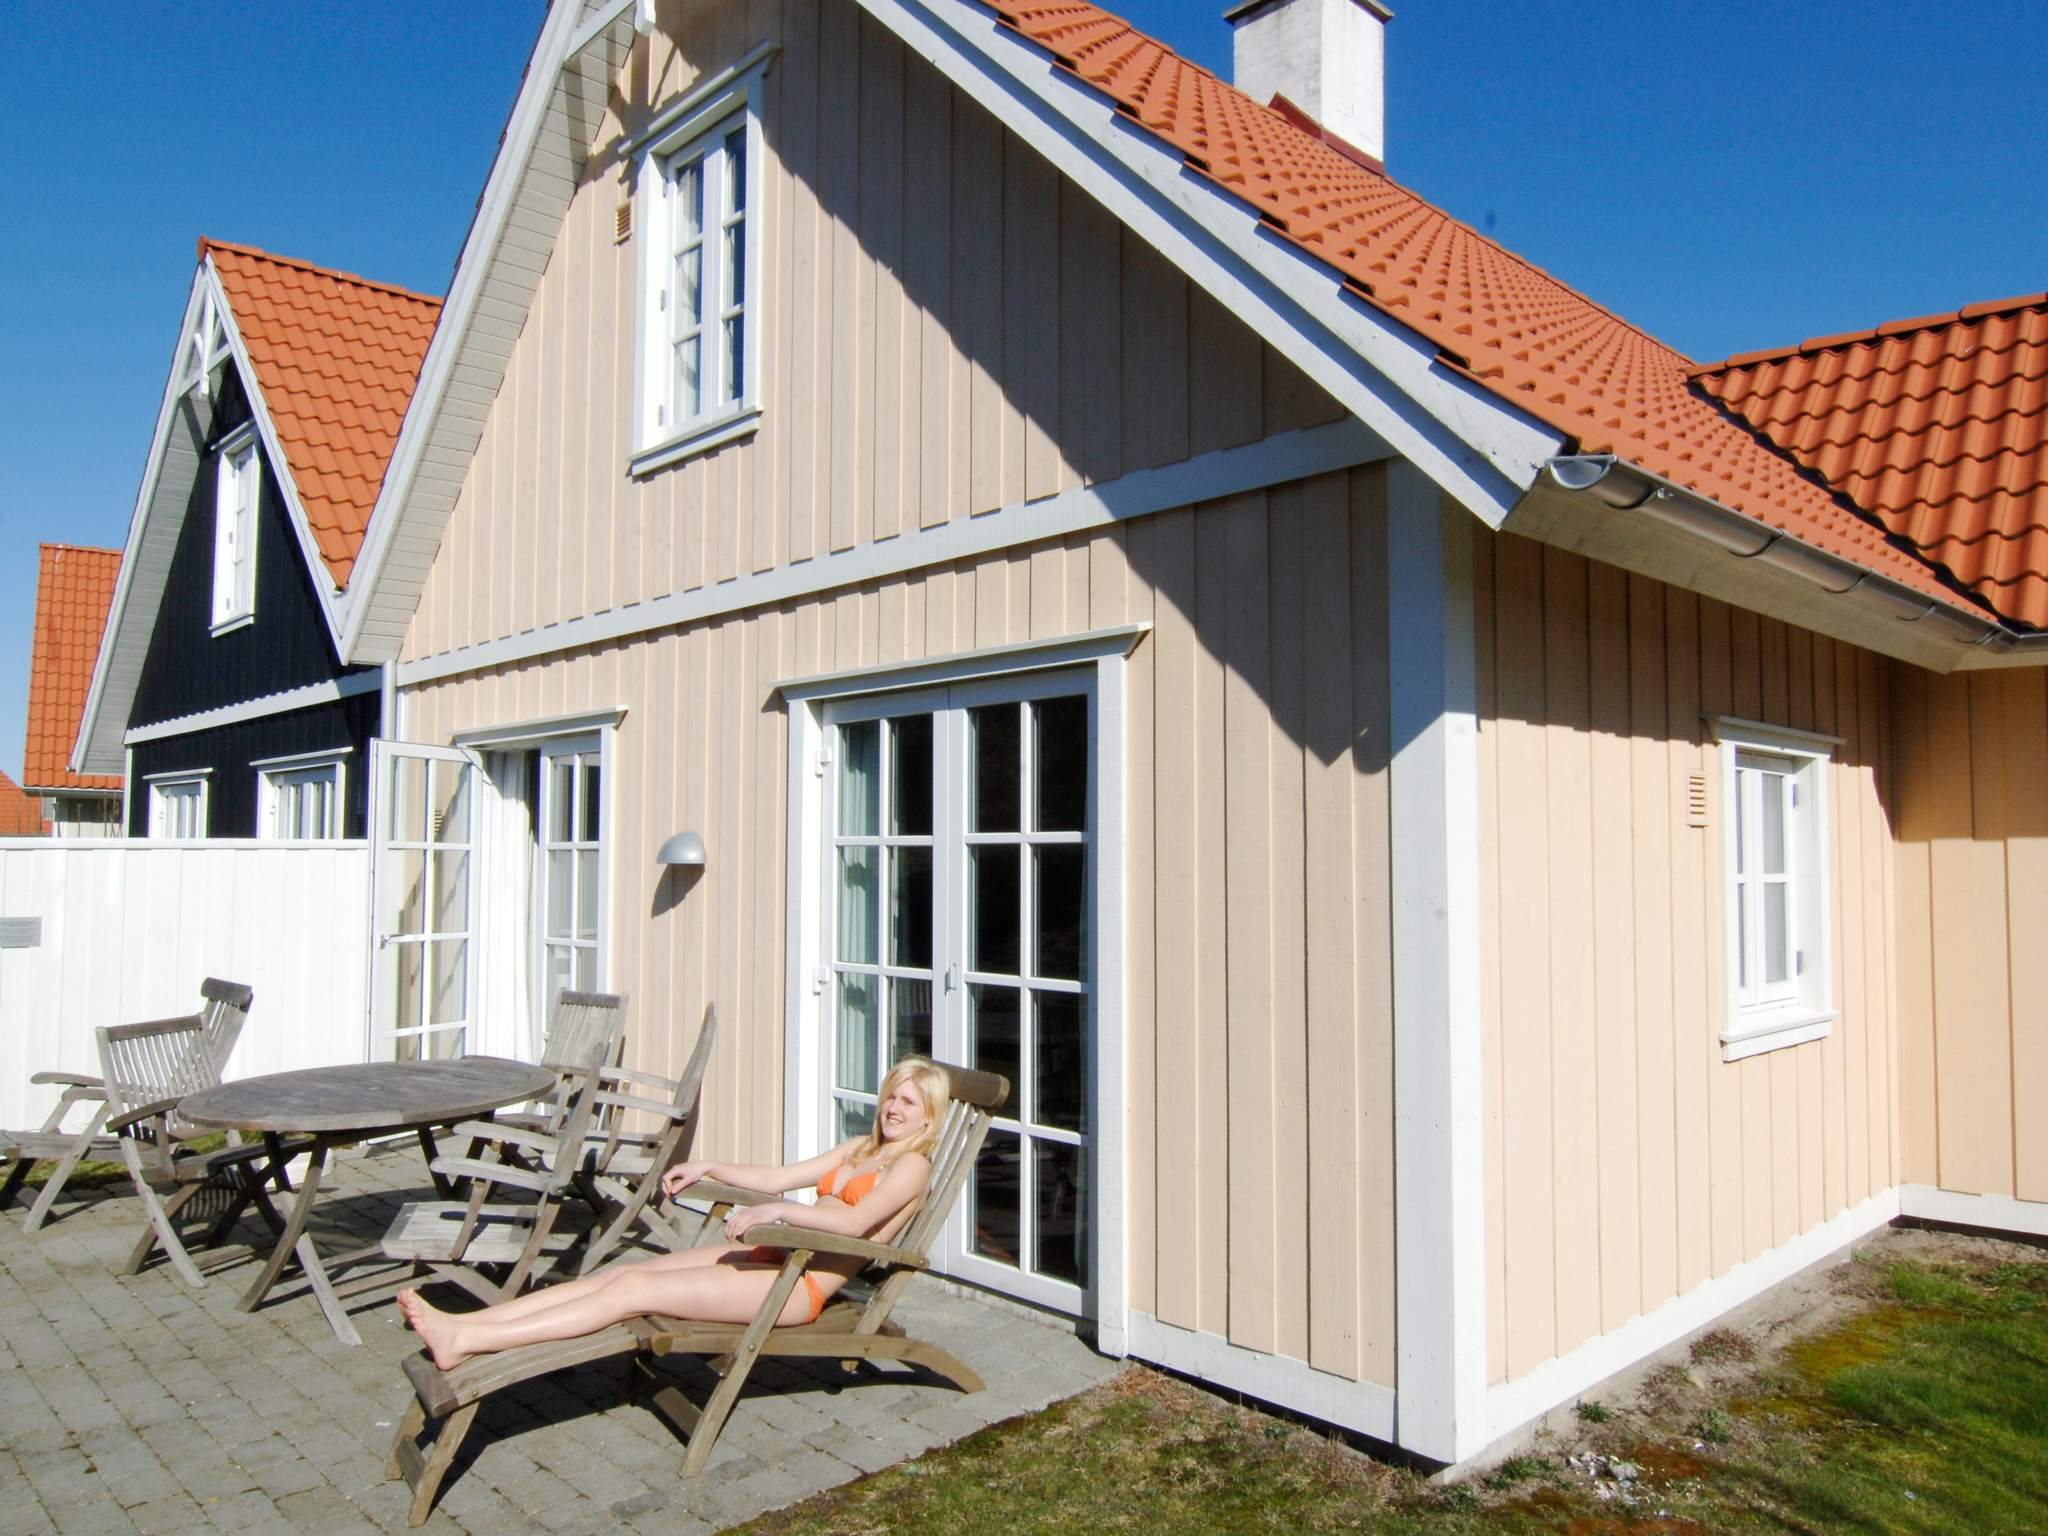 Ferienhaus Blåvand (224791), Blåvand, , Westjütland, Dänemark, Bild 1